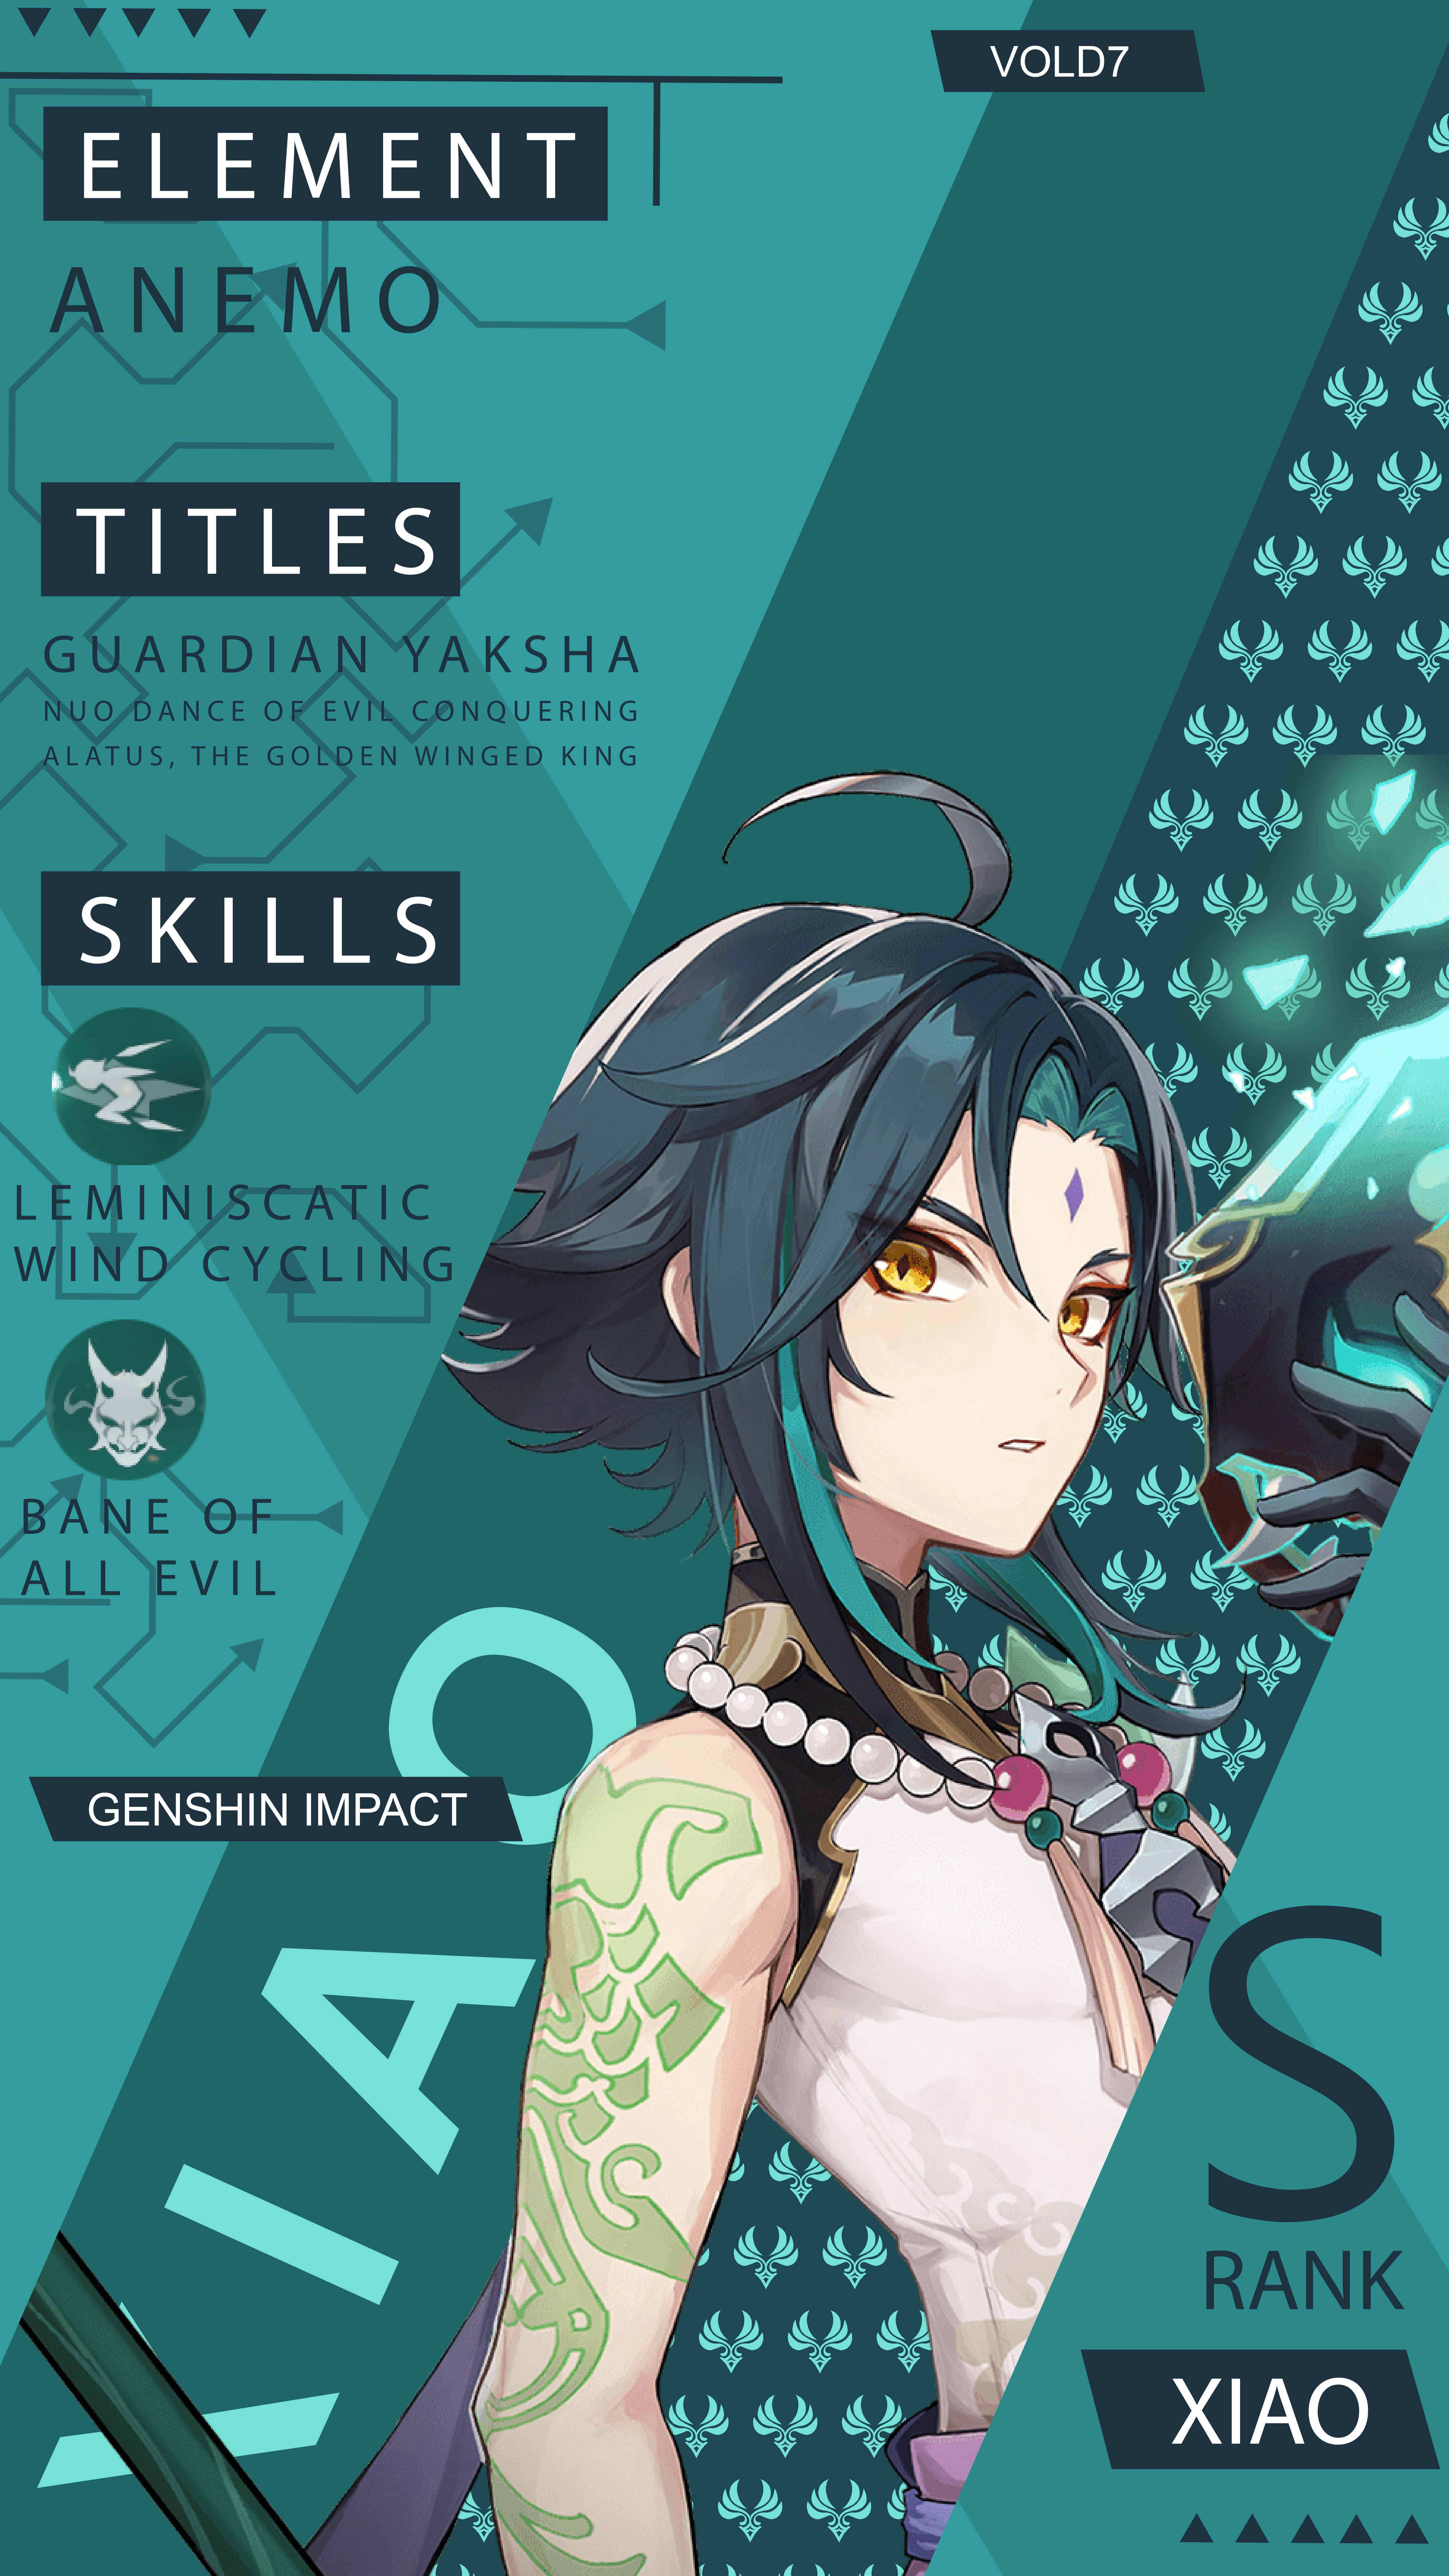 Genshin Impact Xiao Wallpaper Android Anime Wallpaper Impact Anime Art Girl